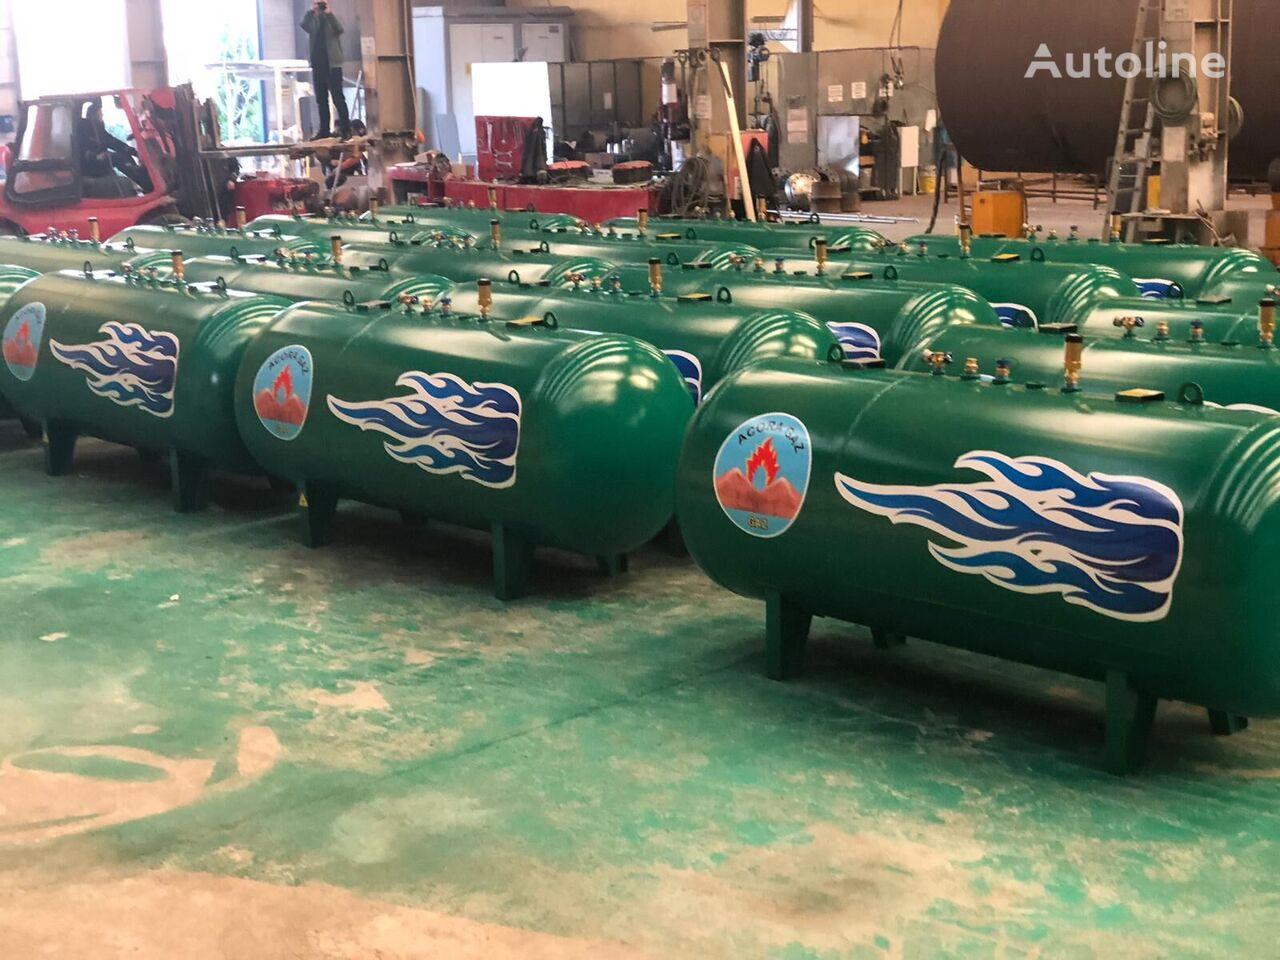 nova Micansan 2019 NEW 3 TO 5M3 DOMESTIC TANK cisterna za gas